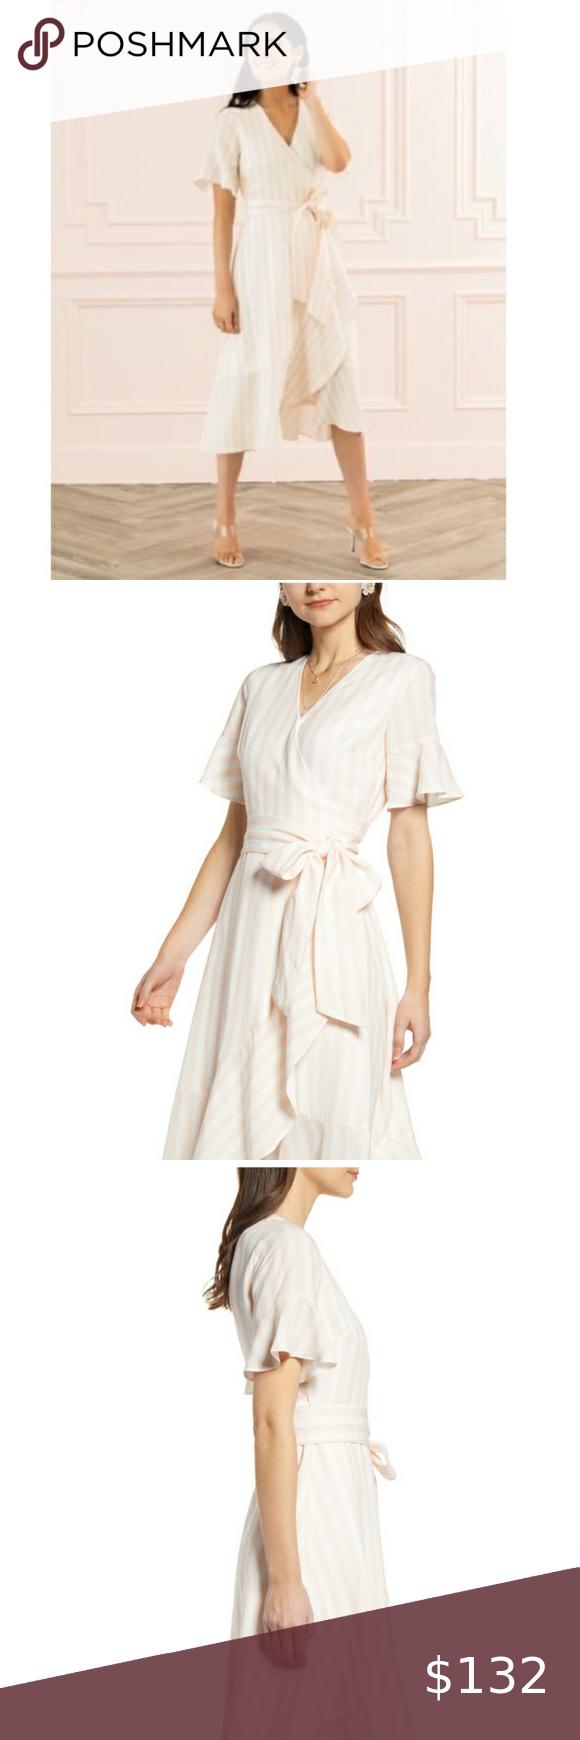 Chantilly Wrap Maxi Dress Jessakae Tan Dress Bridesmaid Dress Modest Dress Headband Tan S Tan Bridesmaid Dresses Wrap Dress Outfit Wrap Dress Bridesmaid [ 1400 x 1000 Pixel ]